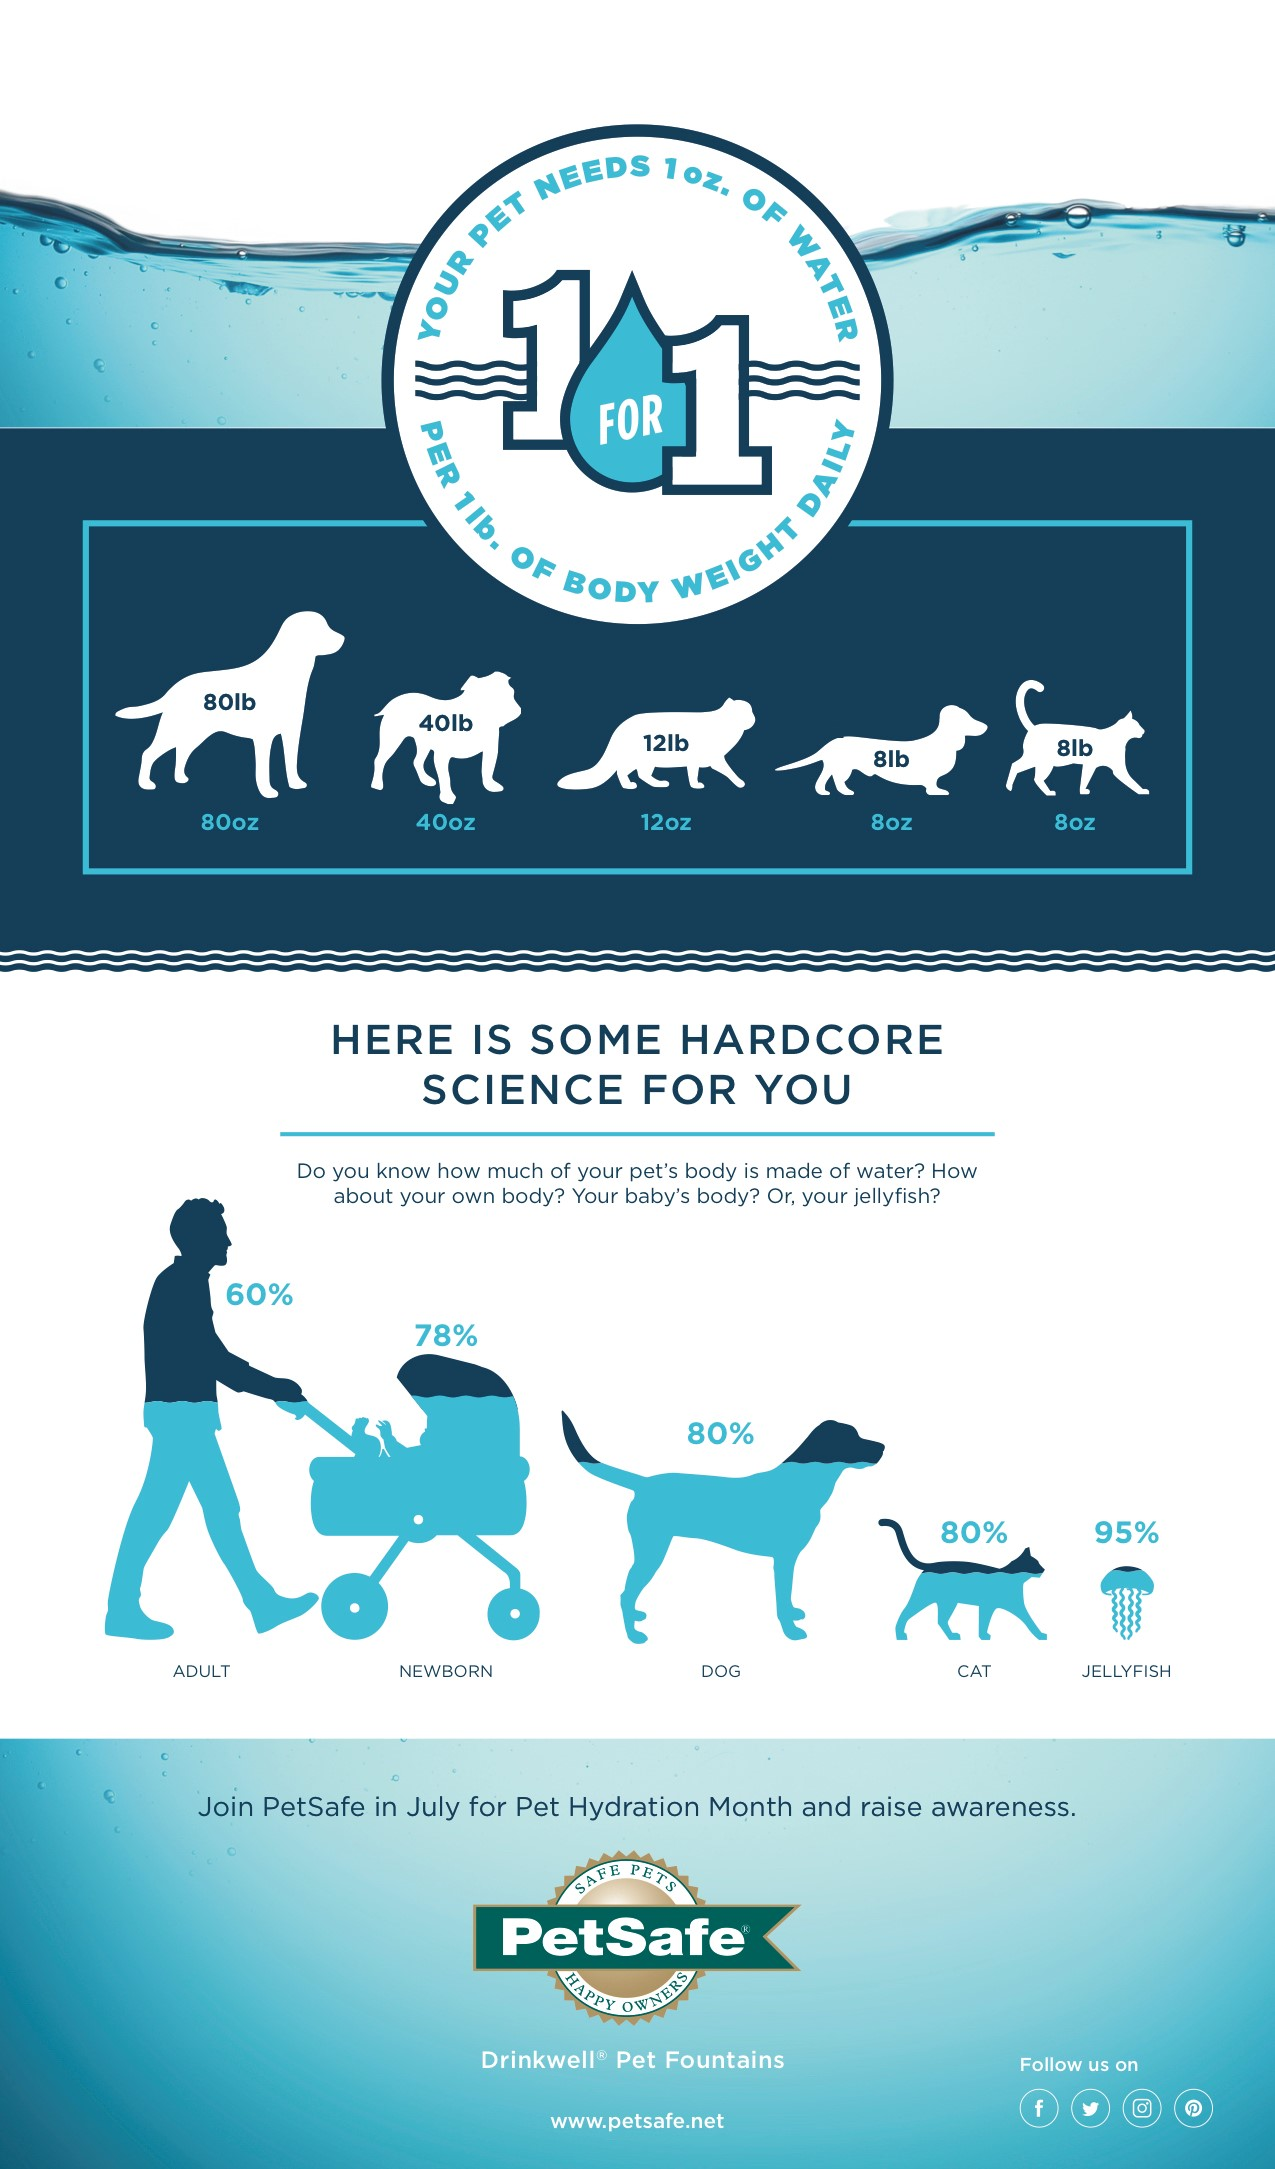 petsafe-pet-hydration-month-infographic-july-that-cat-blog